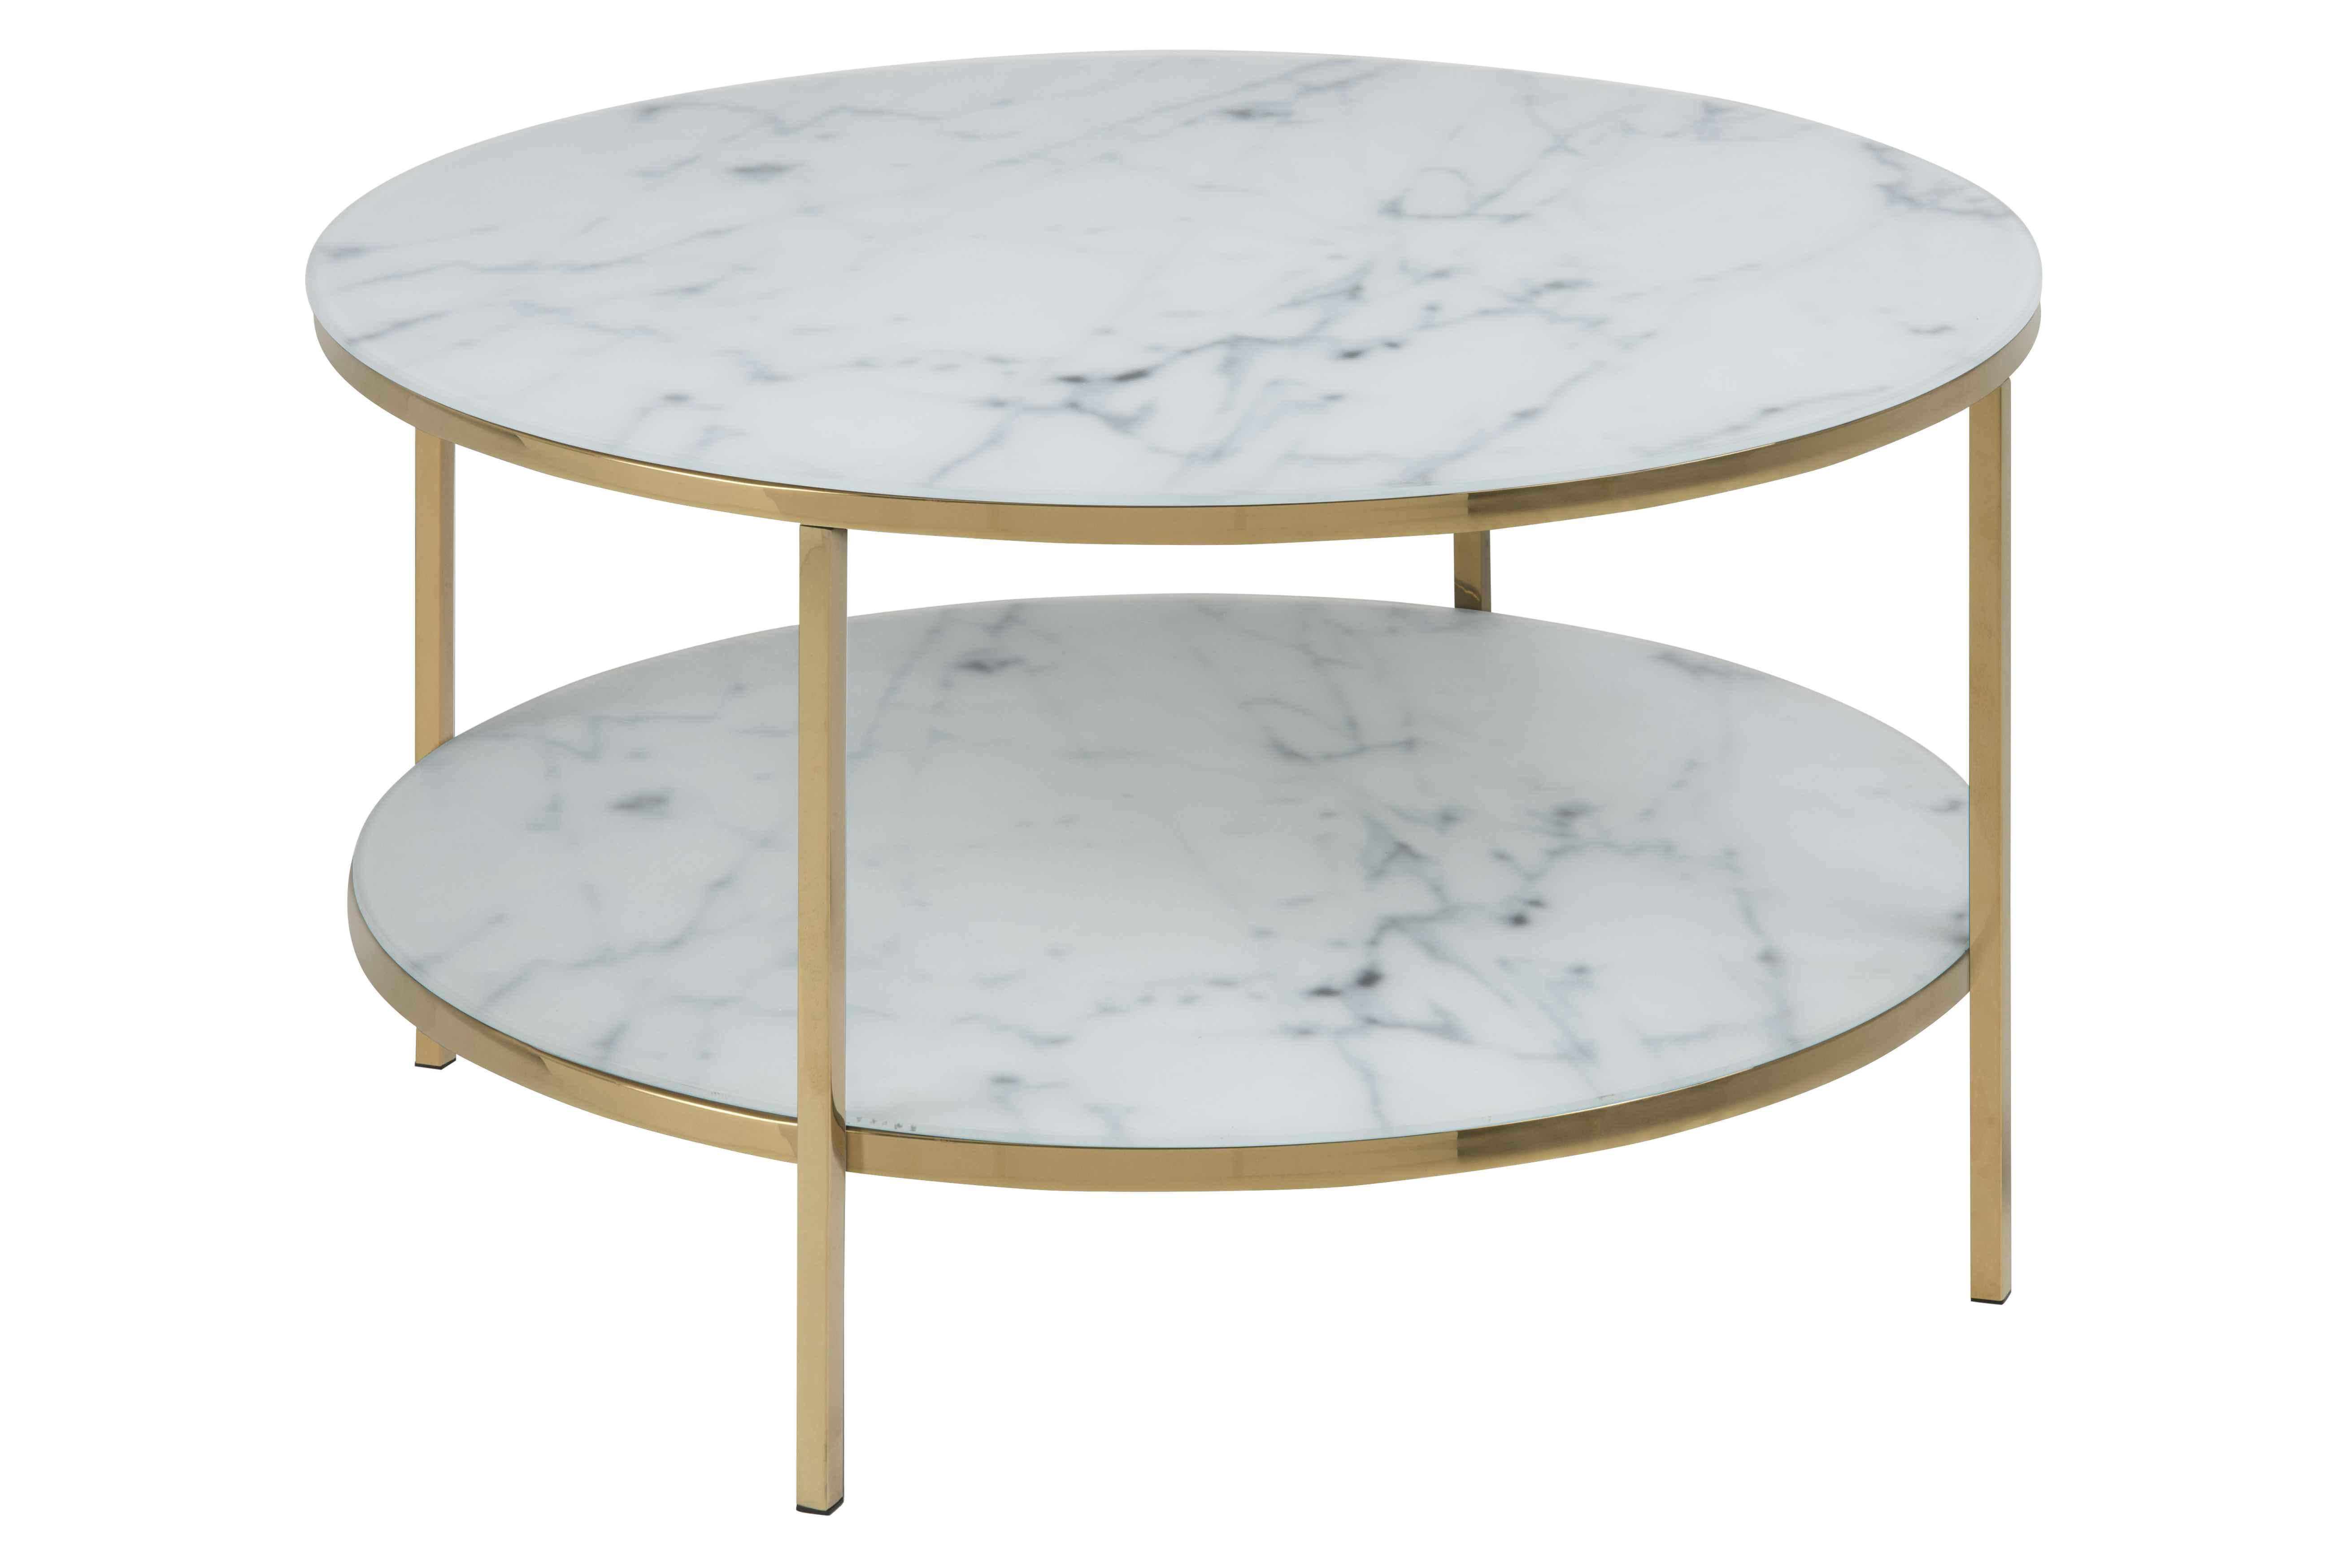 Image of   Alisma sofabord - glas m. hvid marmorprint/guld metal, rund (Ø:80)